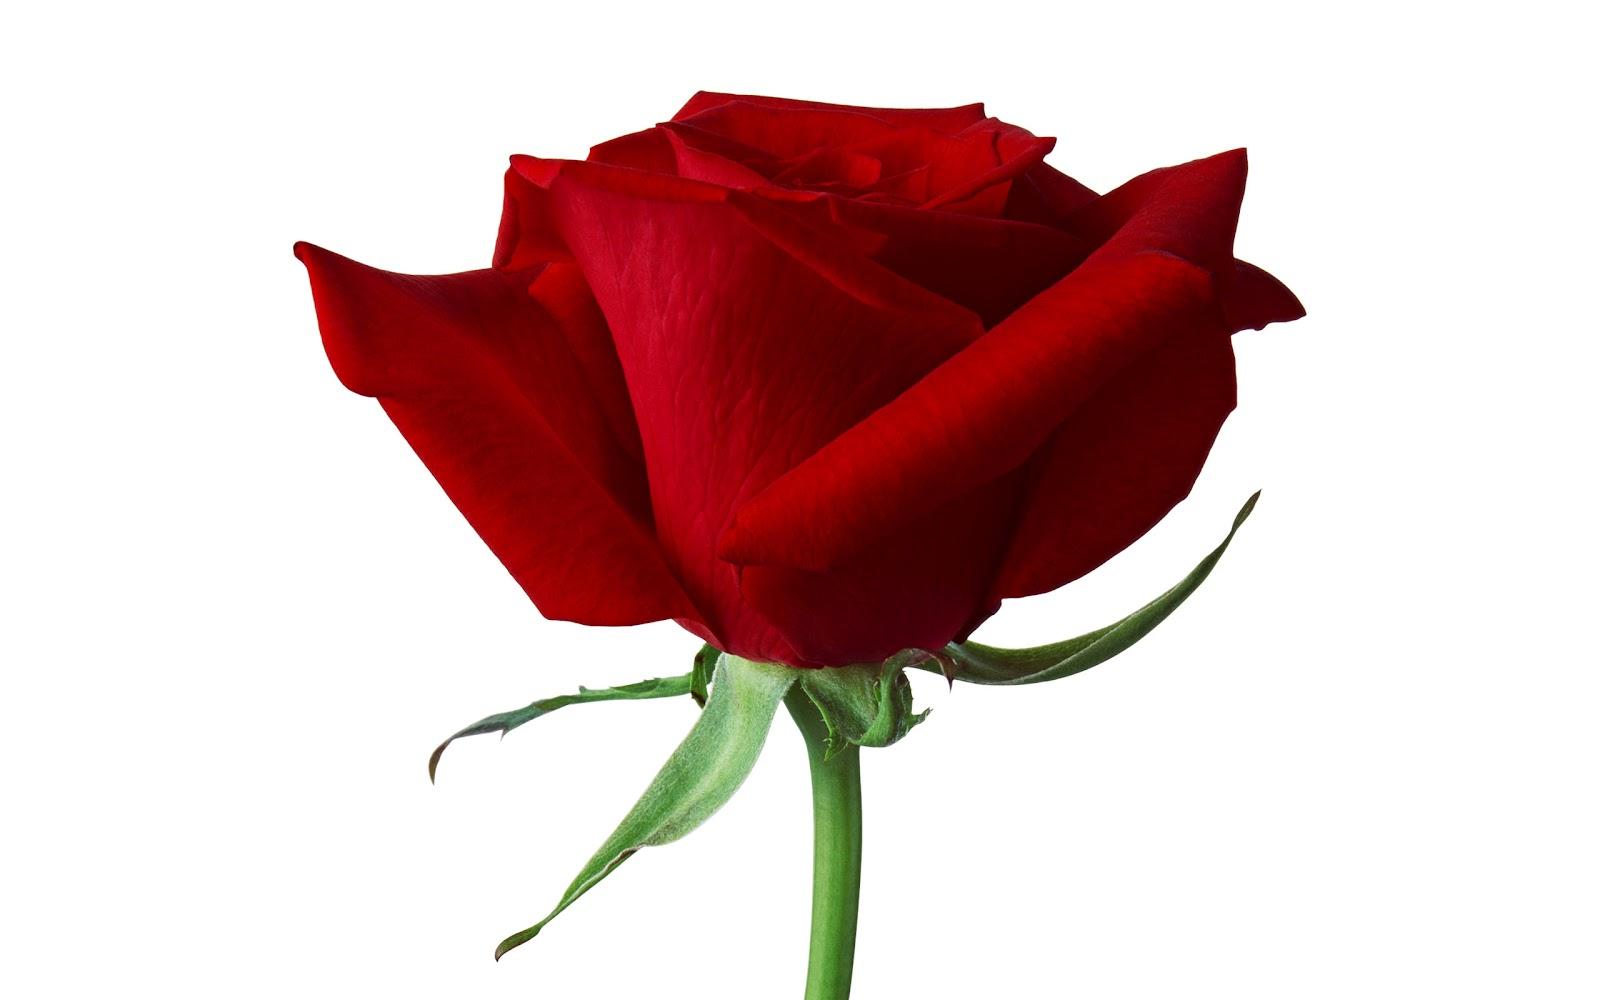 Hd Wallpapers Of Single Red Rose Adsleaf Com